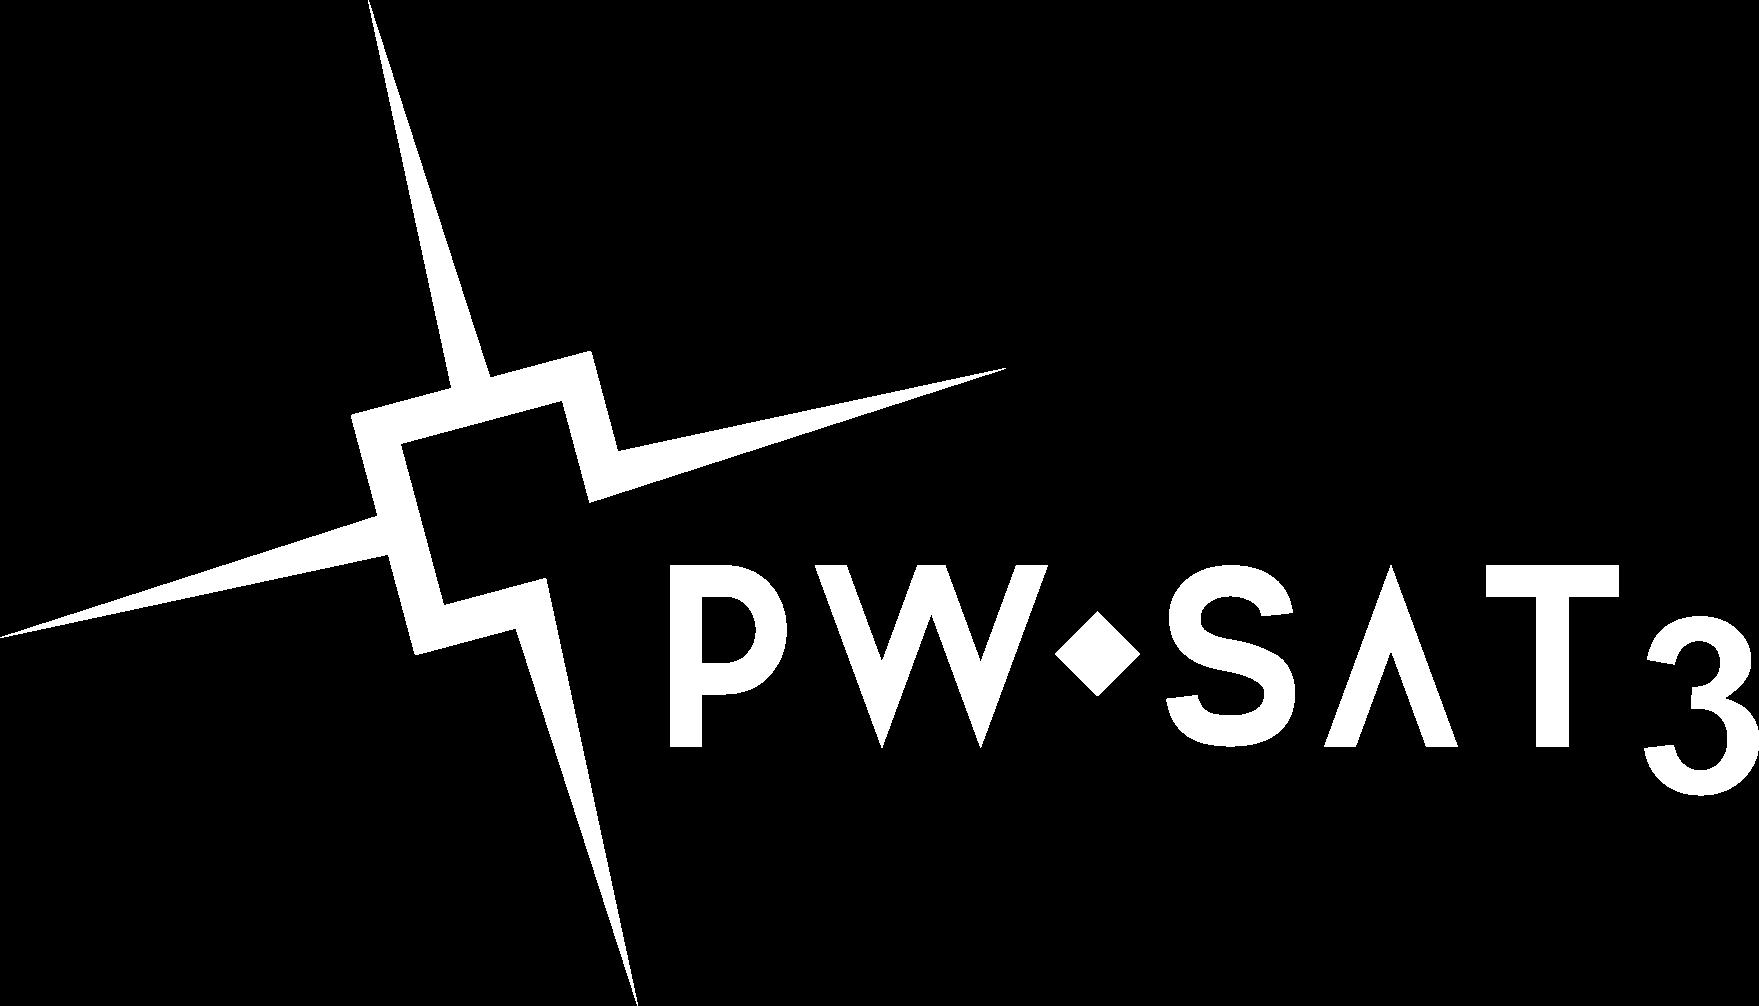 PW-Sat3